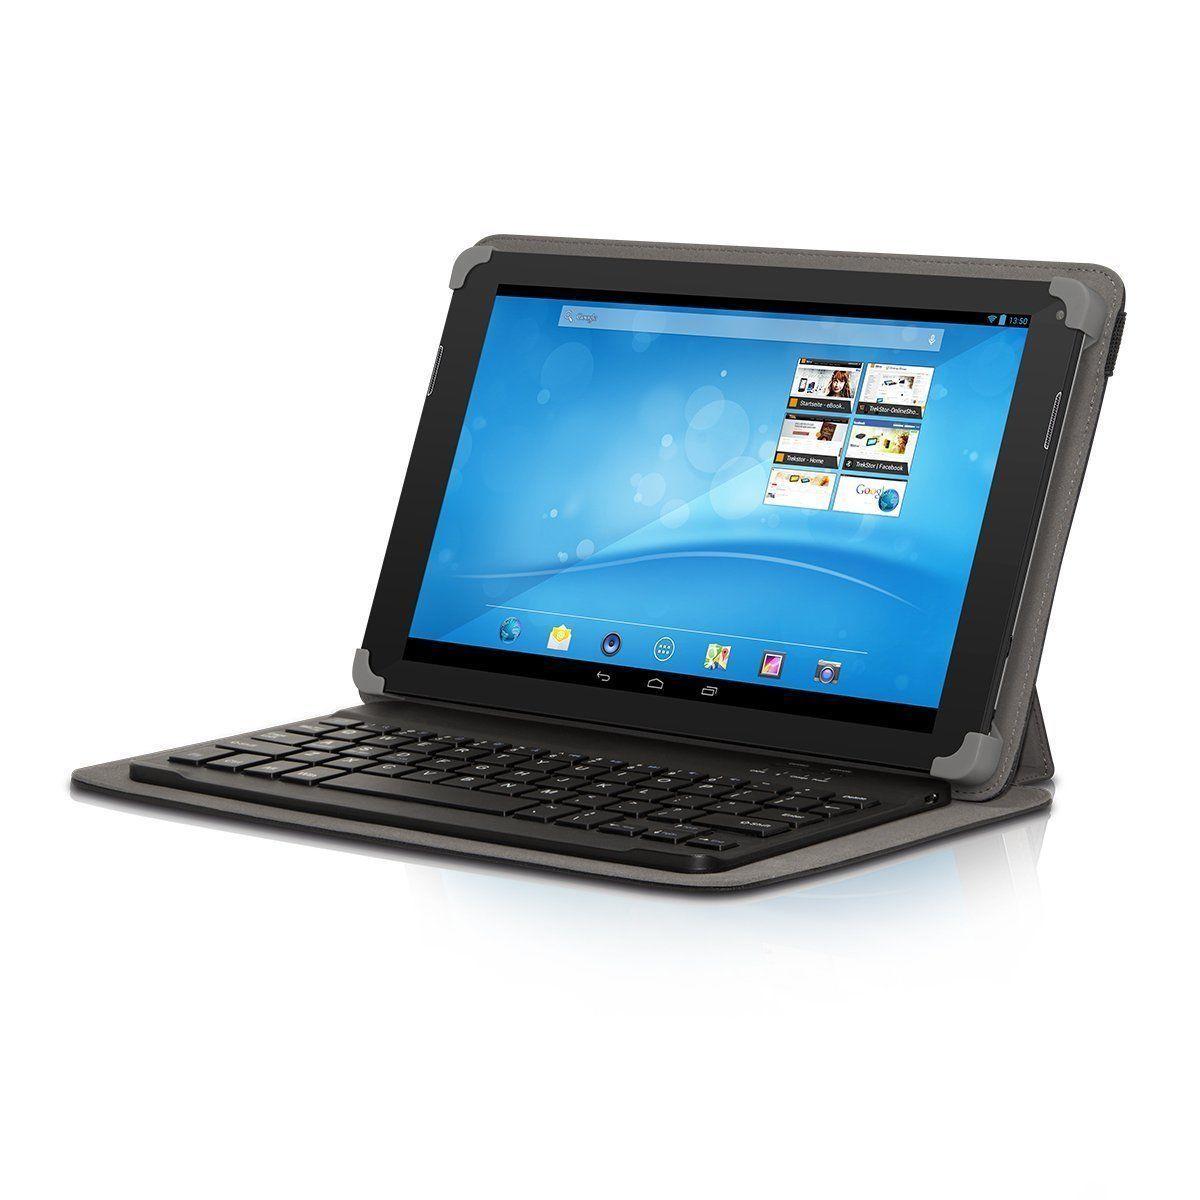 TrekStor SurfTab breeze 10.1 quad 8GB Tablet, WLAN, 25,7 cm (10,1 Zoll)- schwarz